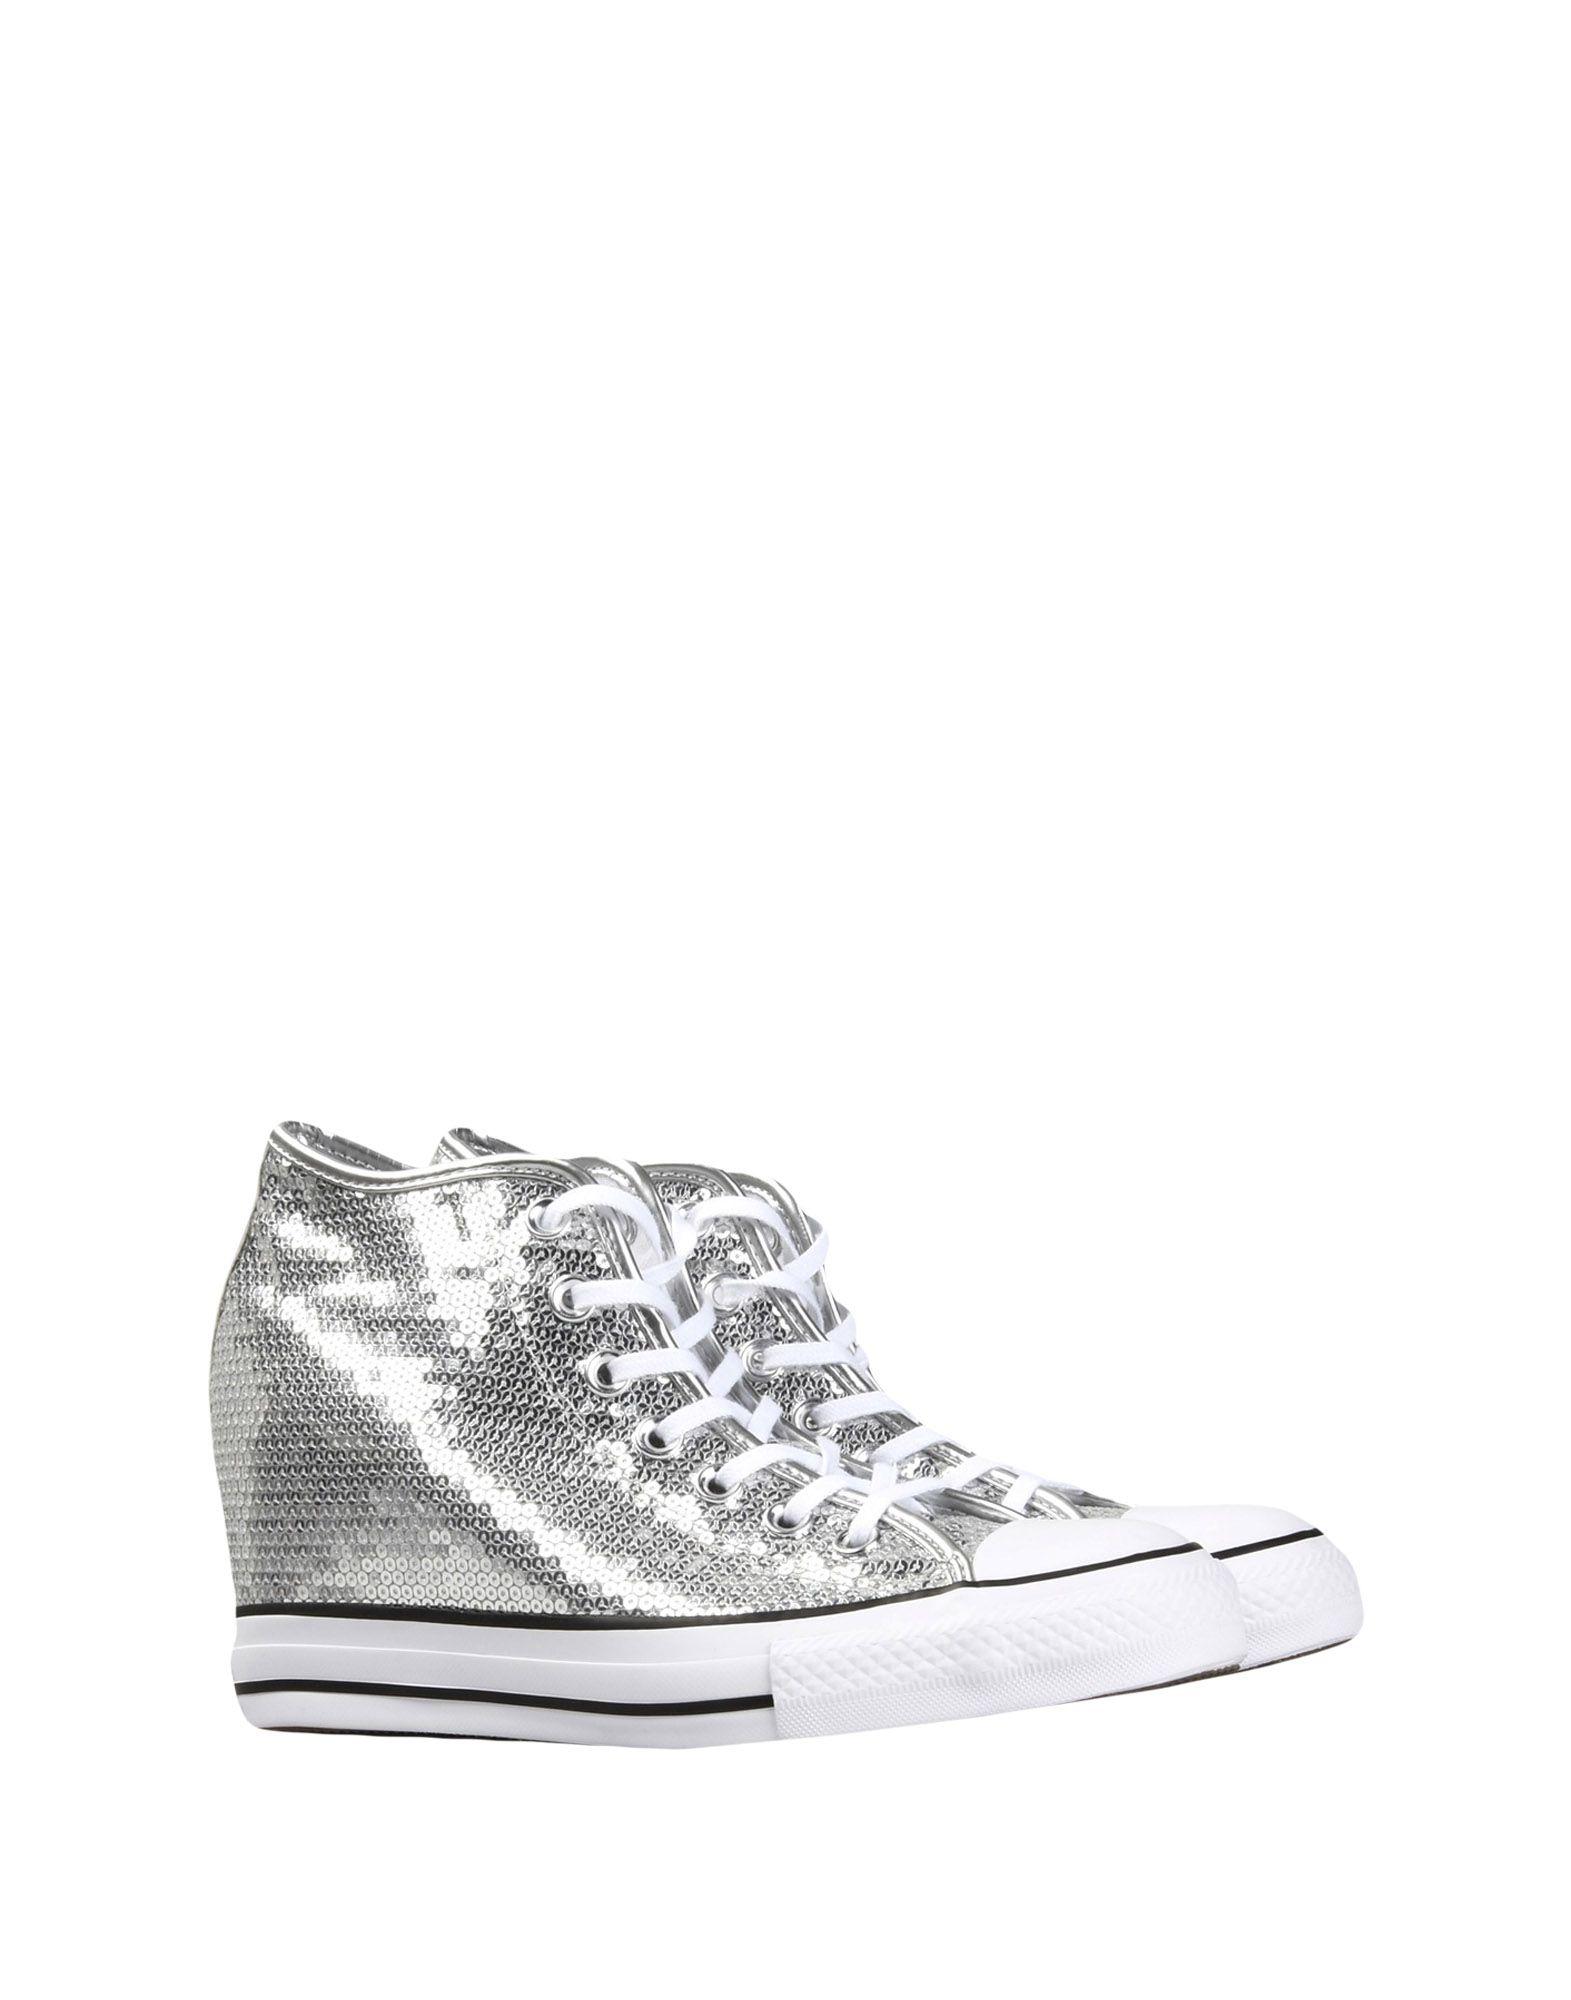 Gut um billige Schuhe zu As tragenConverse All Star Ct As zu Mid Lux Sequins  11216384KK 76fc79